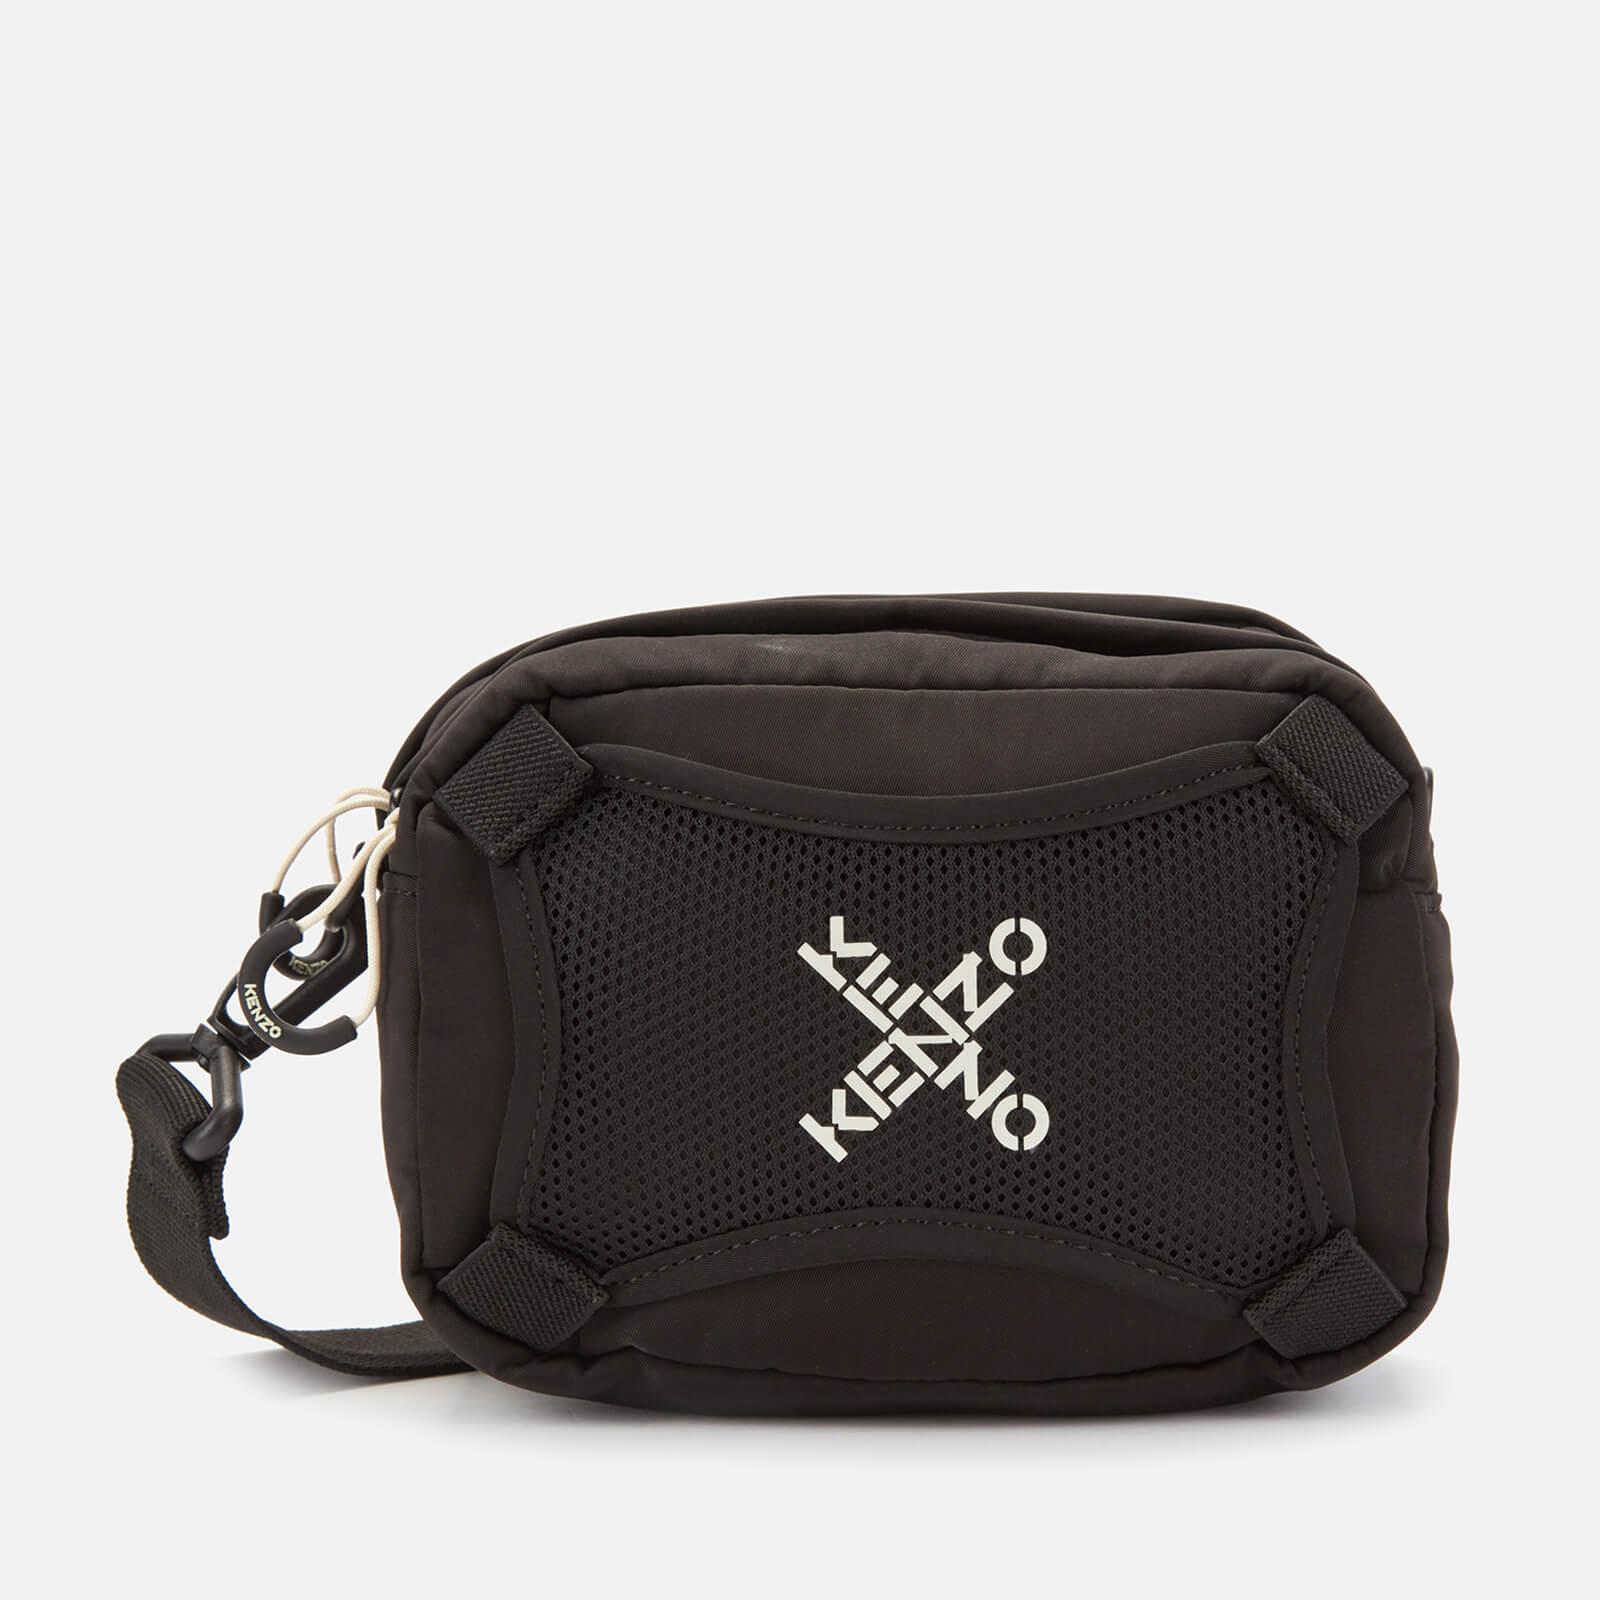 KENZO Men's Sport Cross Body Bag - Black